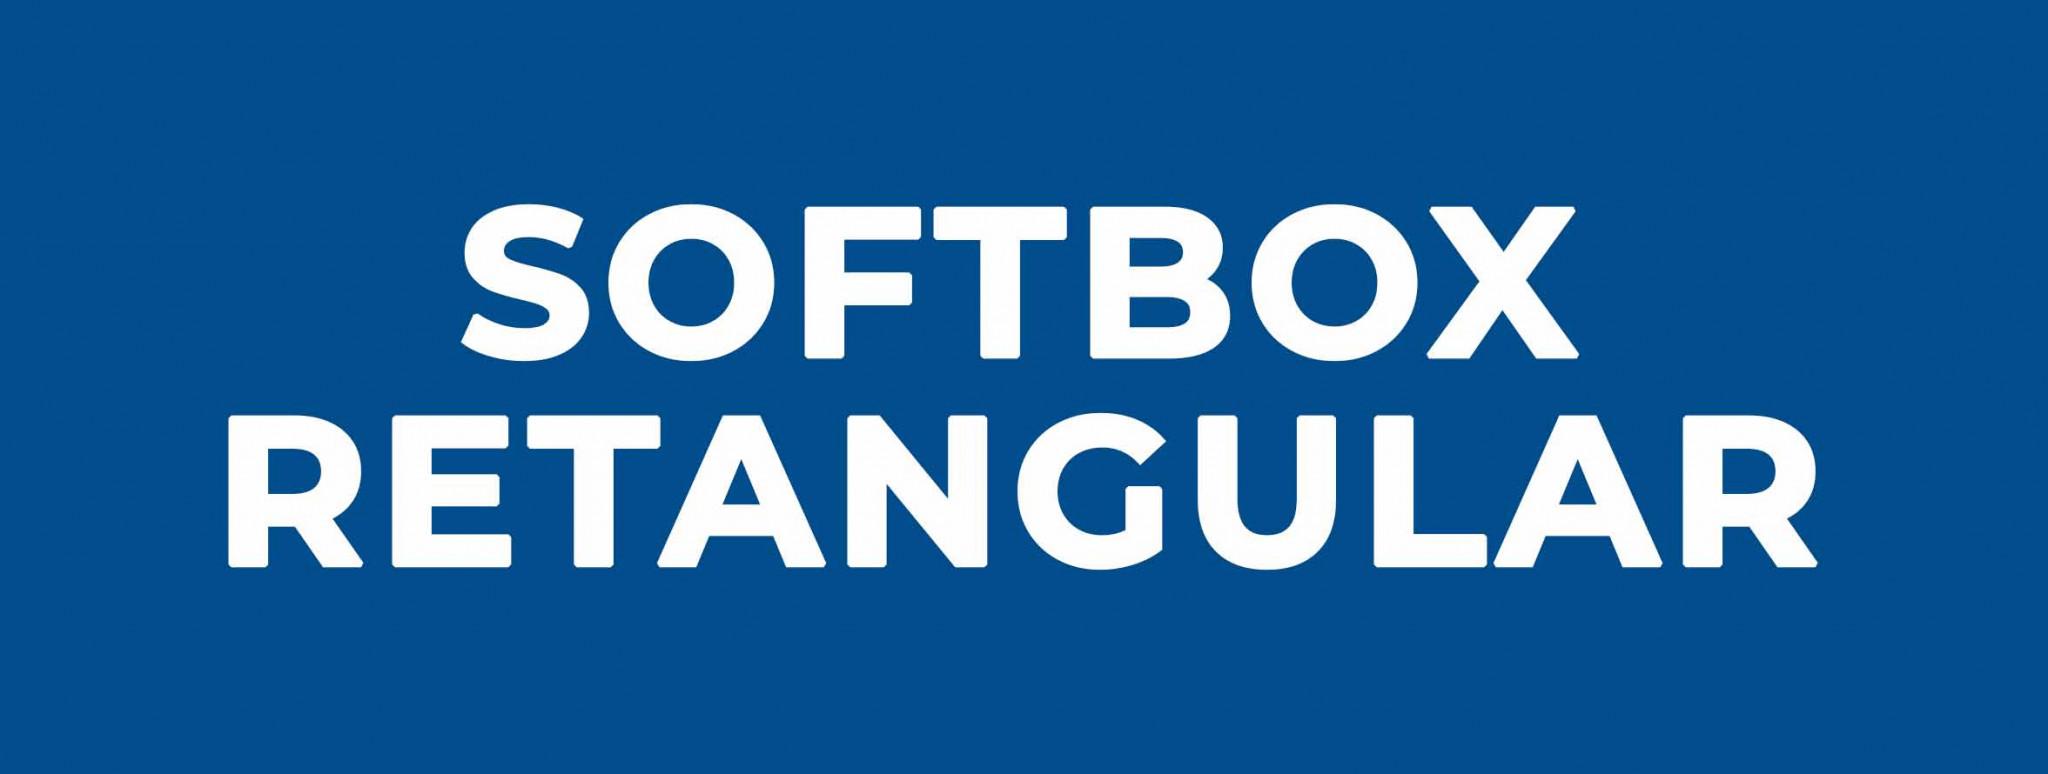 Softbox Retangular